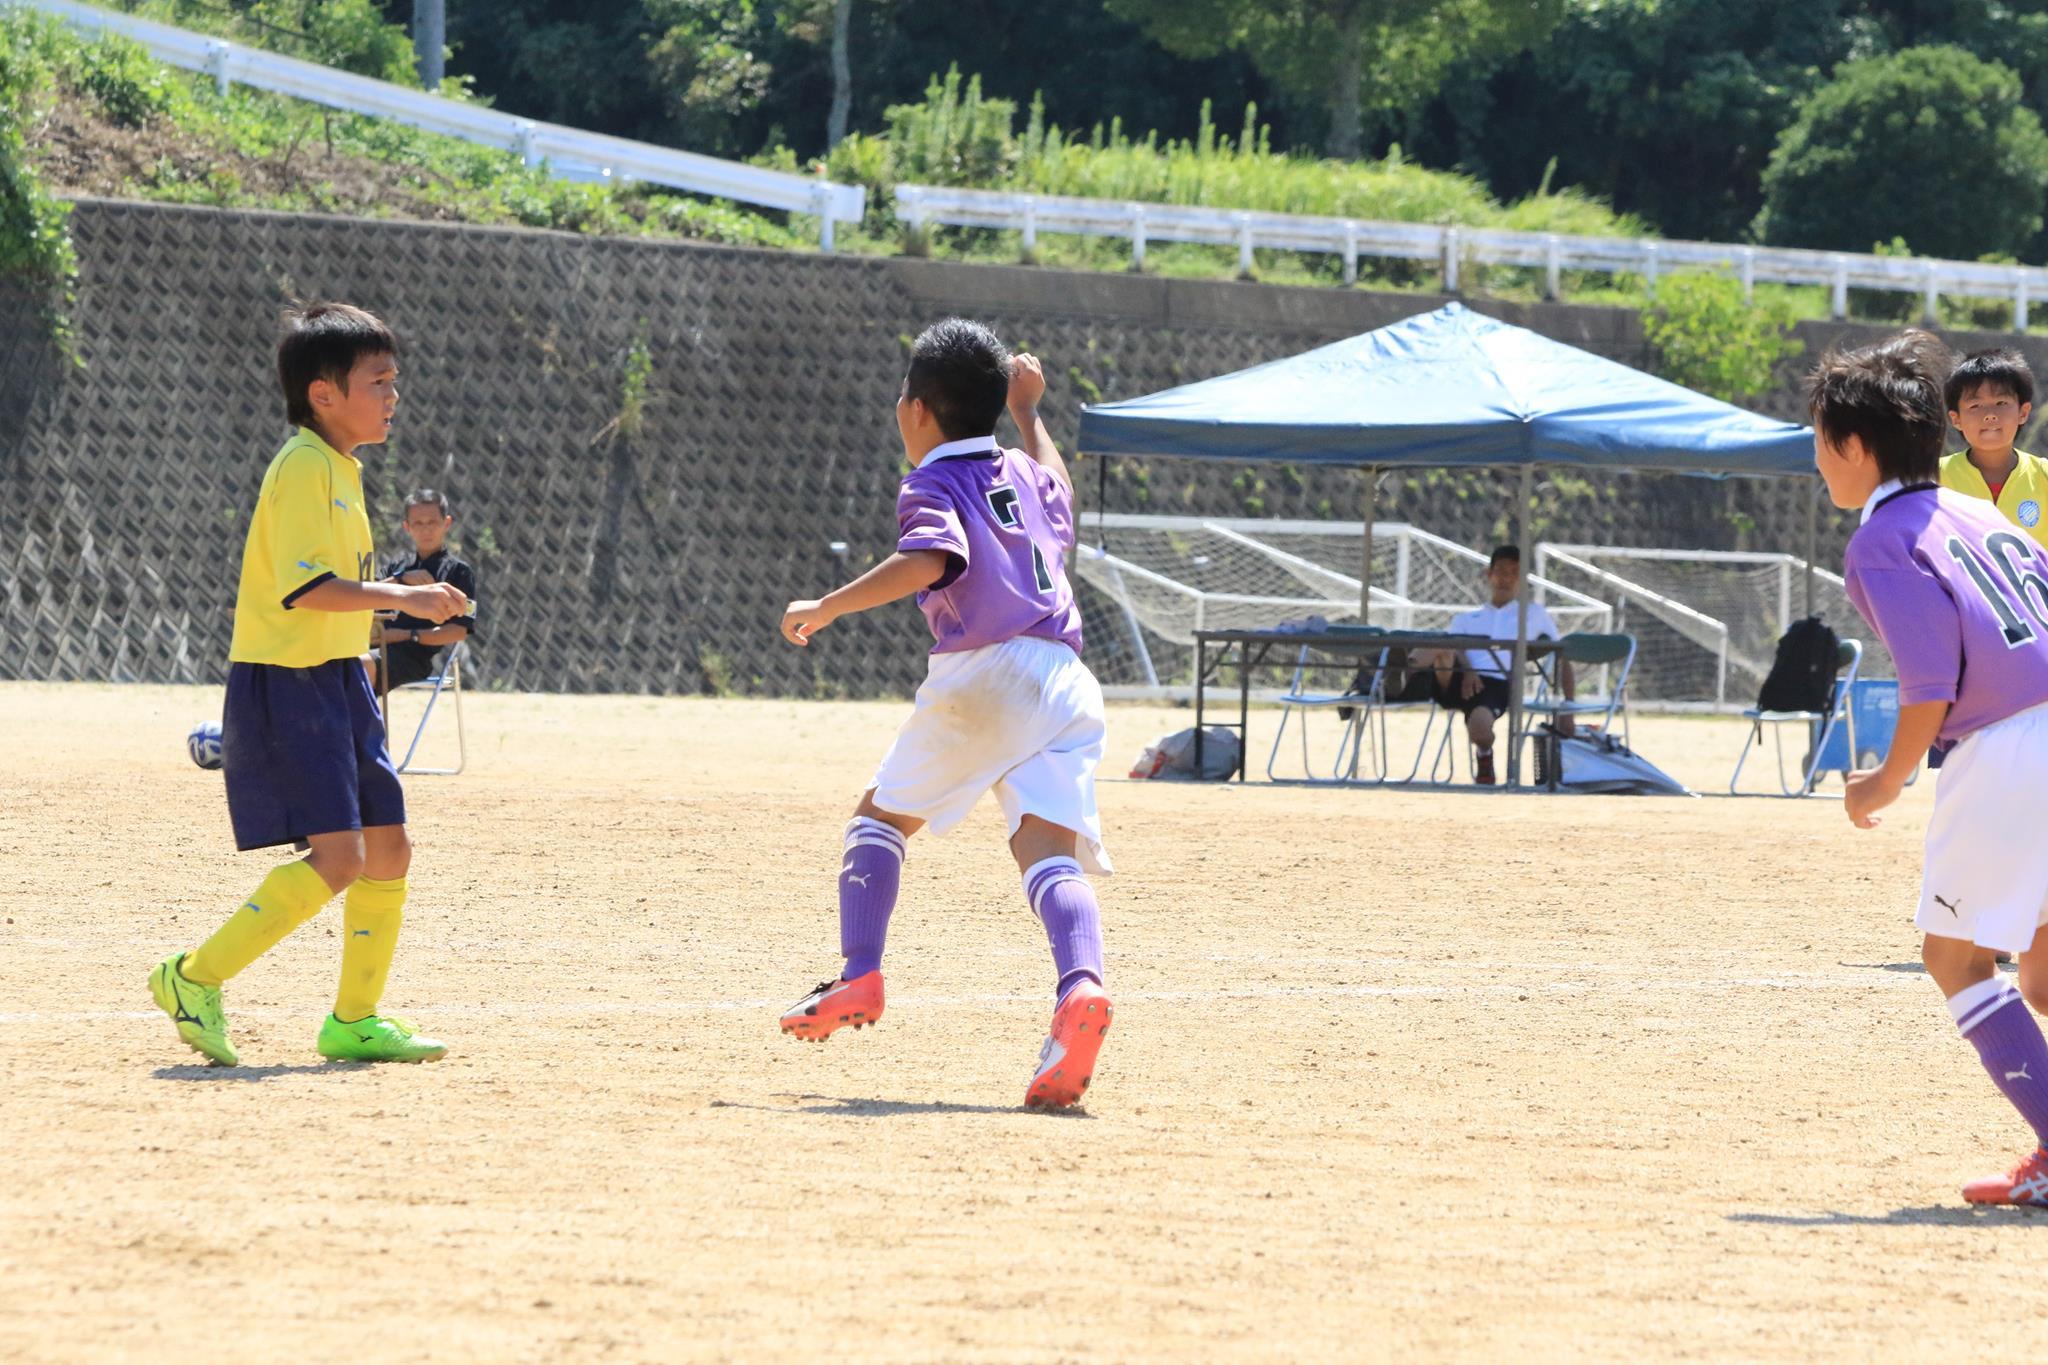 2016U10しんきんカップ中西部予選vs島田第一ゴールシーン07.jpg